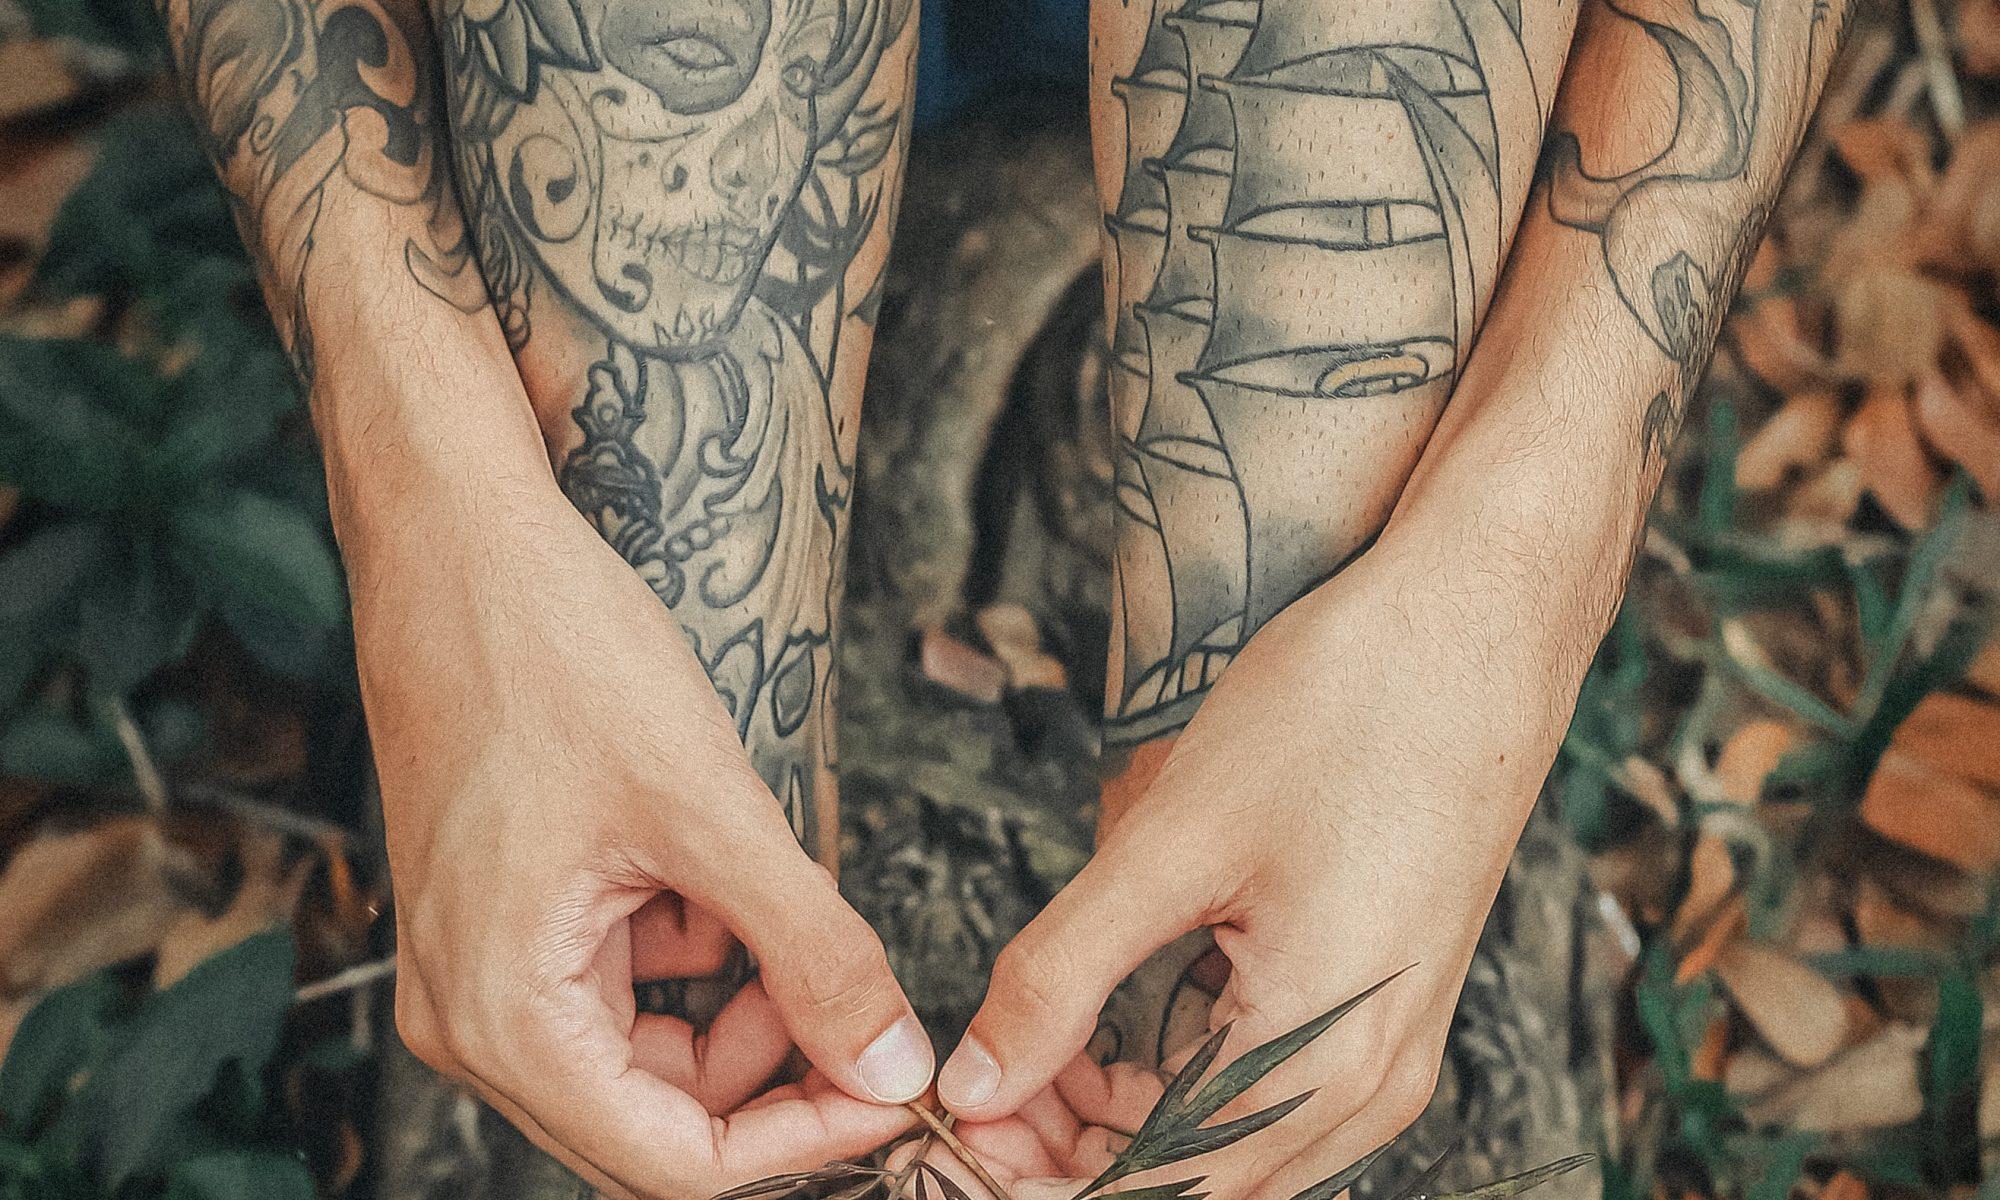 tattooed women holding leaves